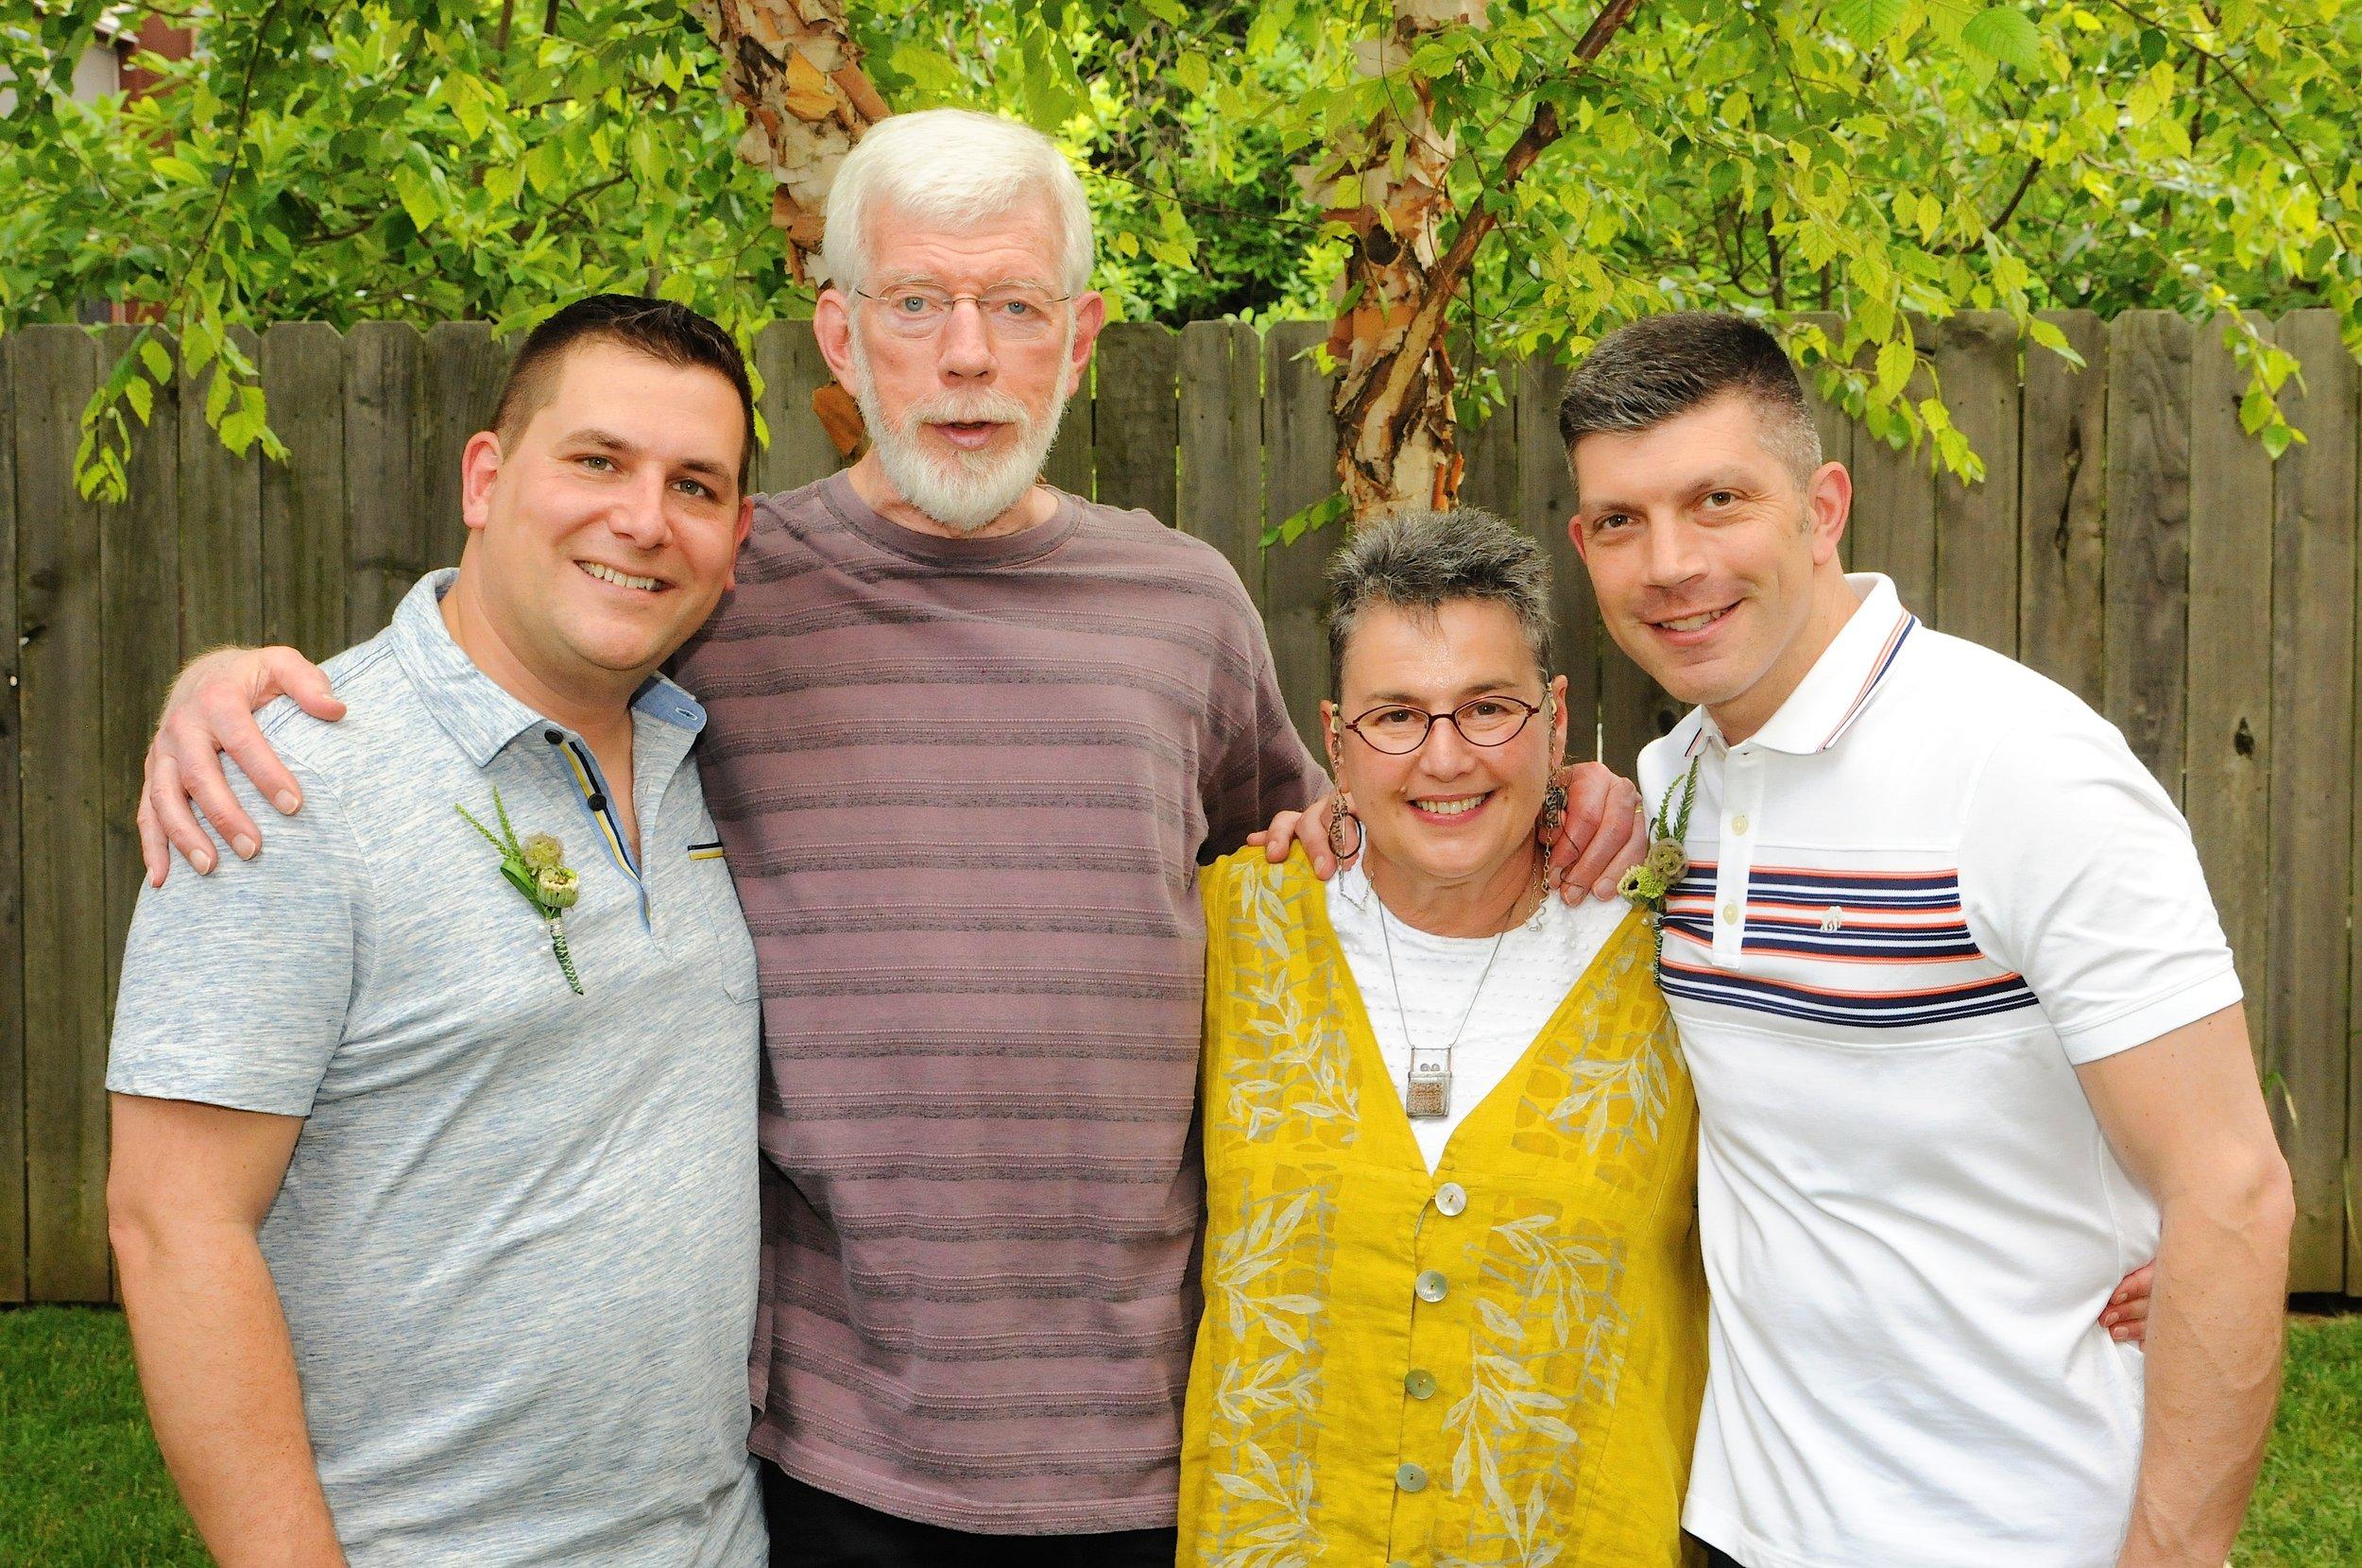 Rod, David, Becka, and John, Collier+Strachan Wedding 2014